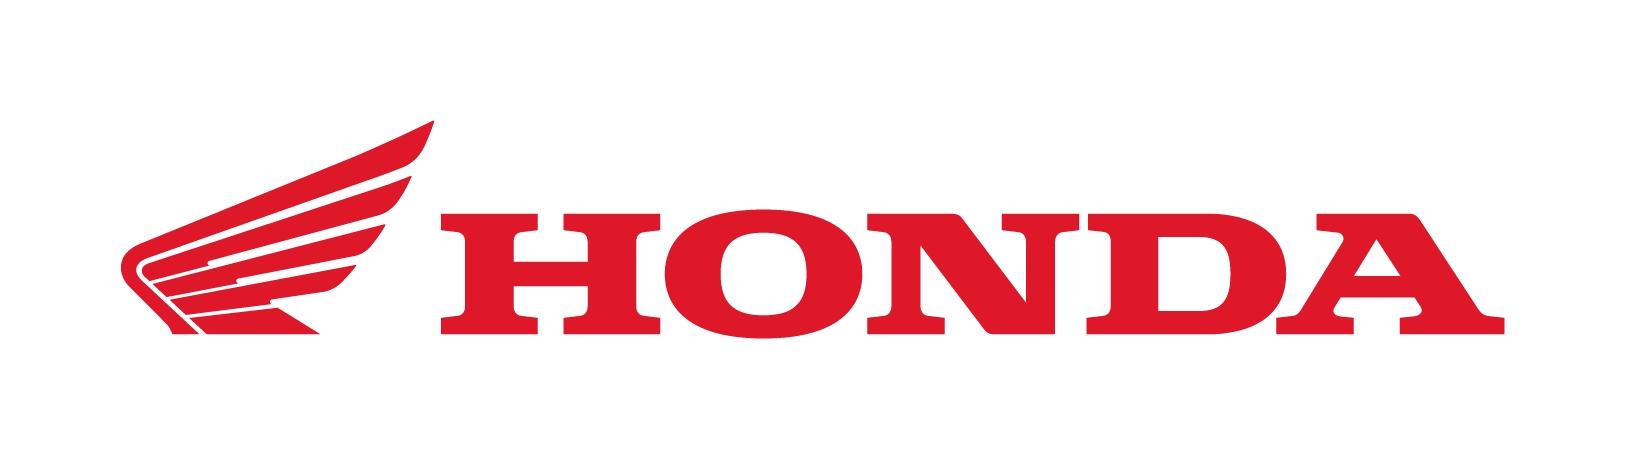 Honda Logo Png Blue Honda Logo Png Logo Honda 1625x456